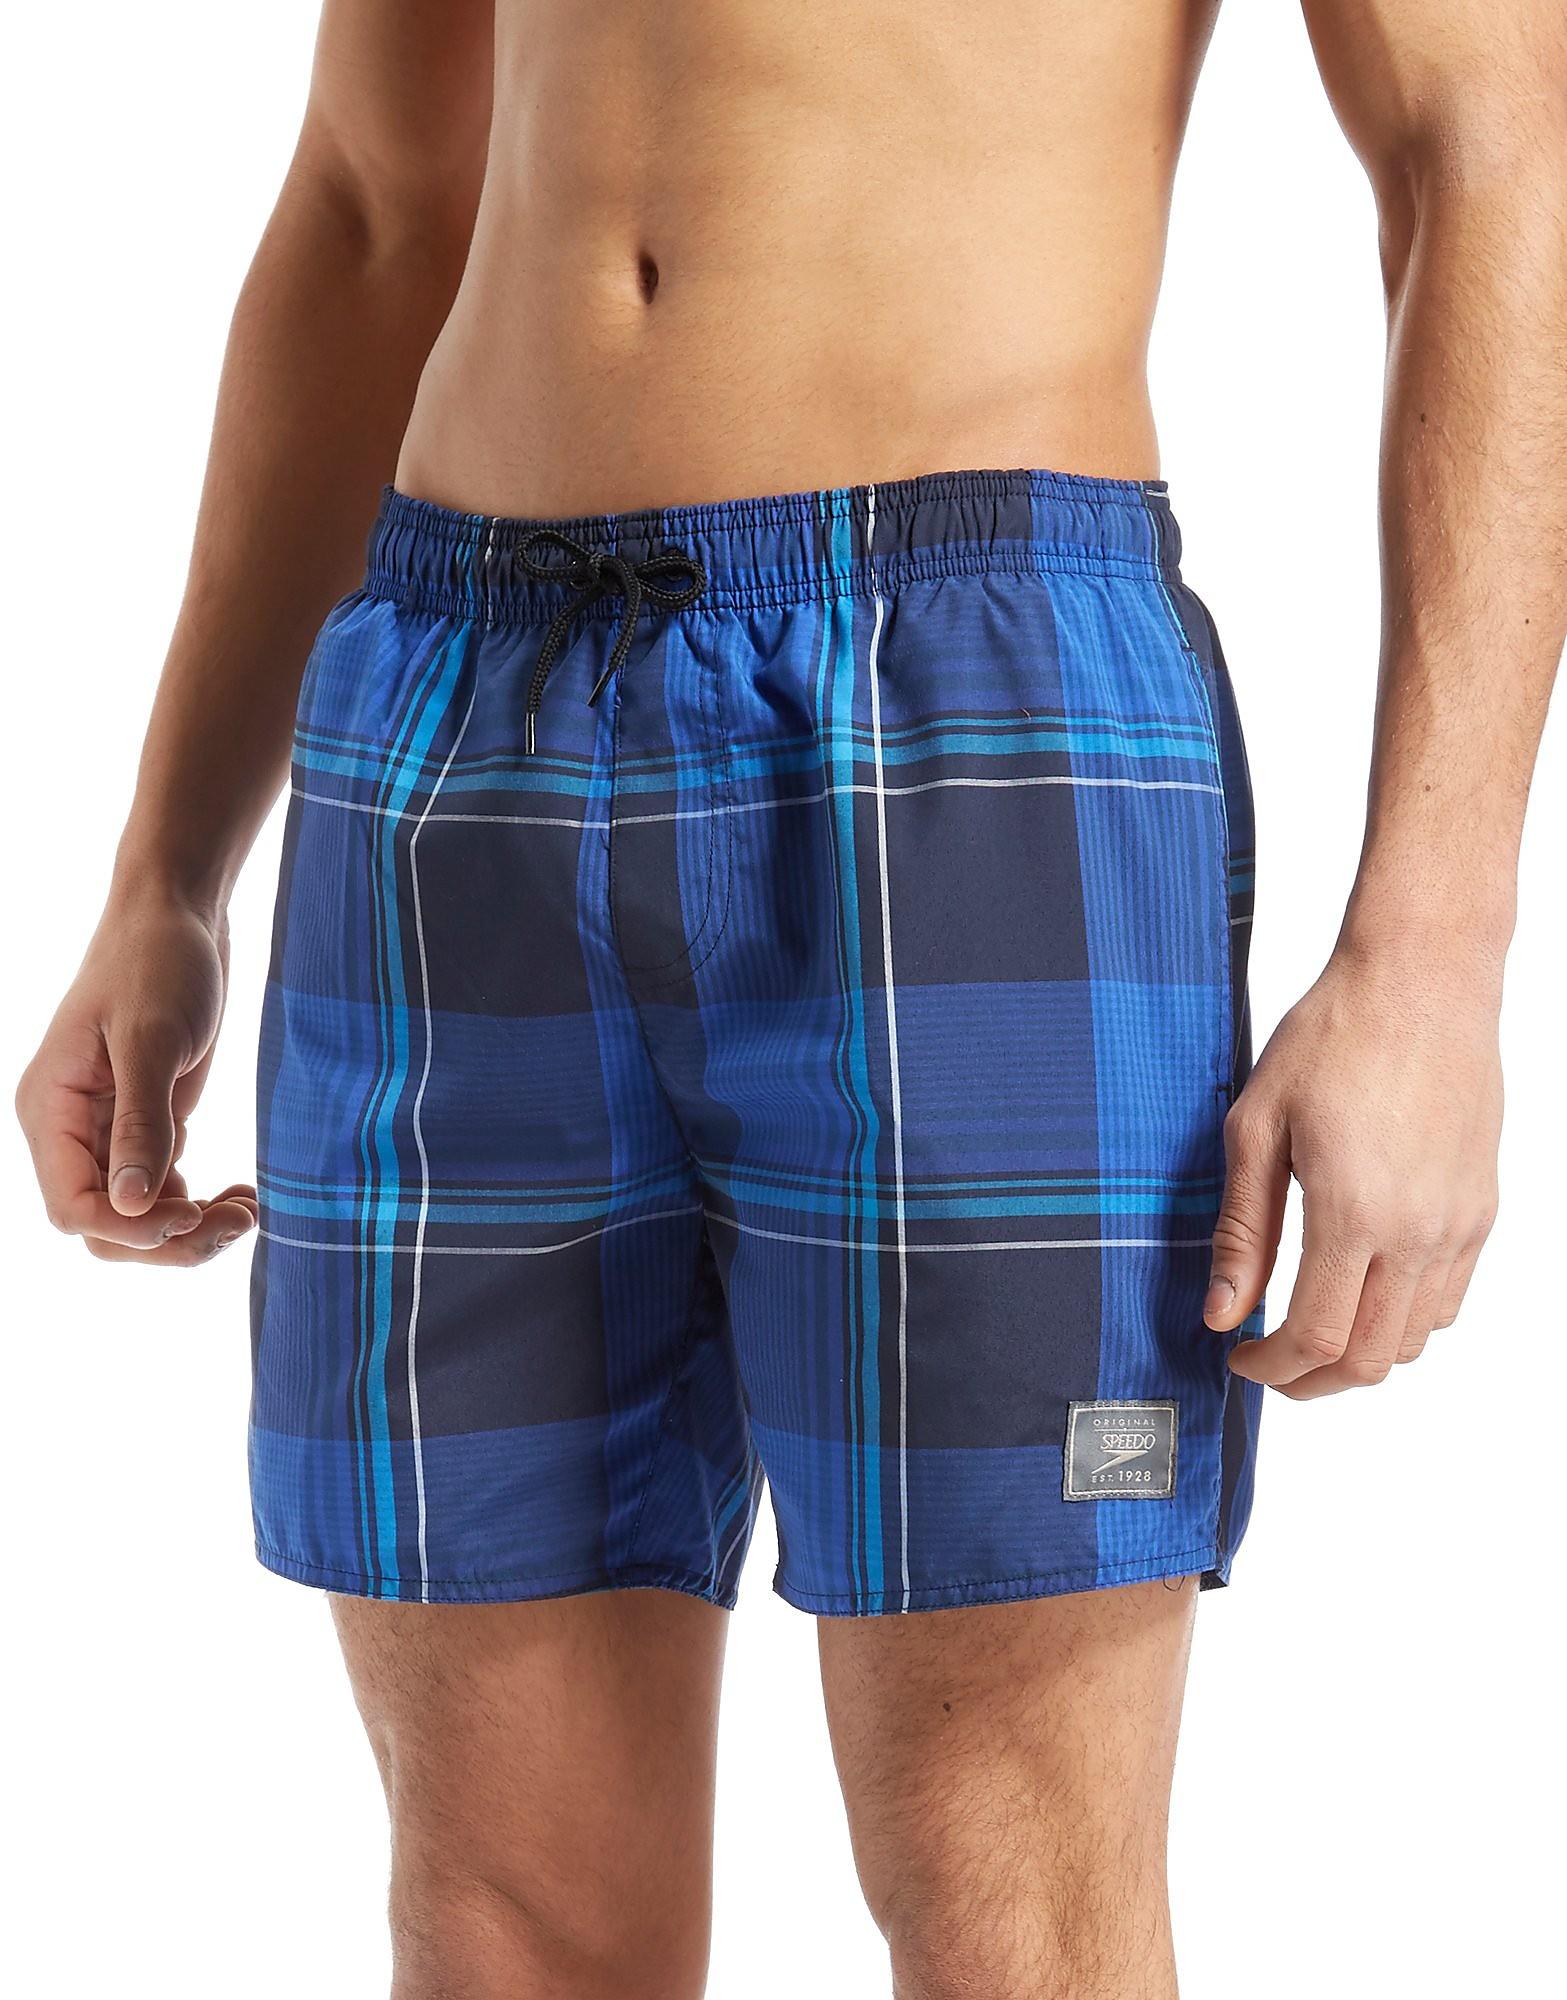 Speedo 16 Inch Check Swim Shorts